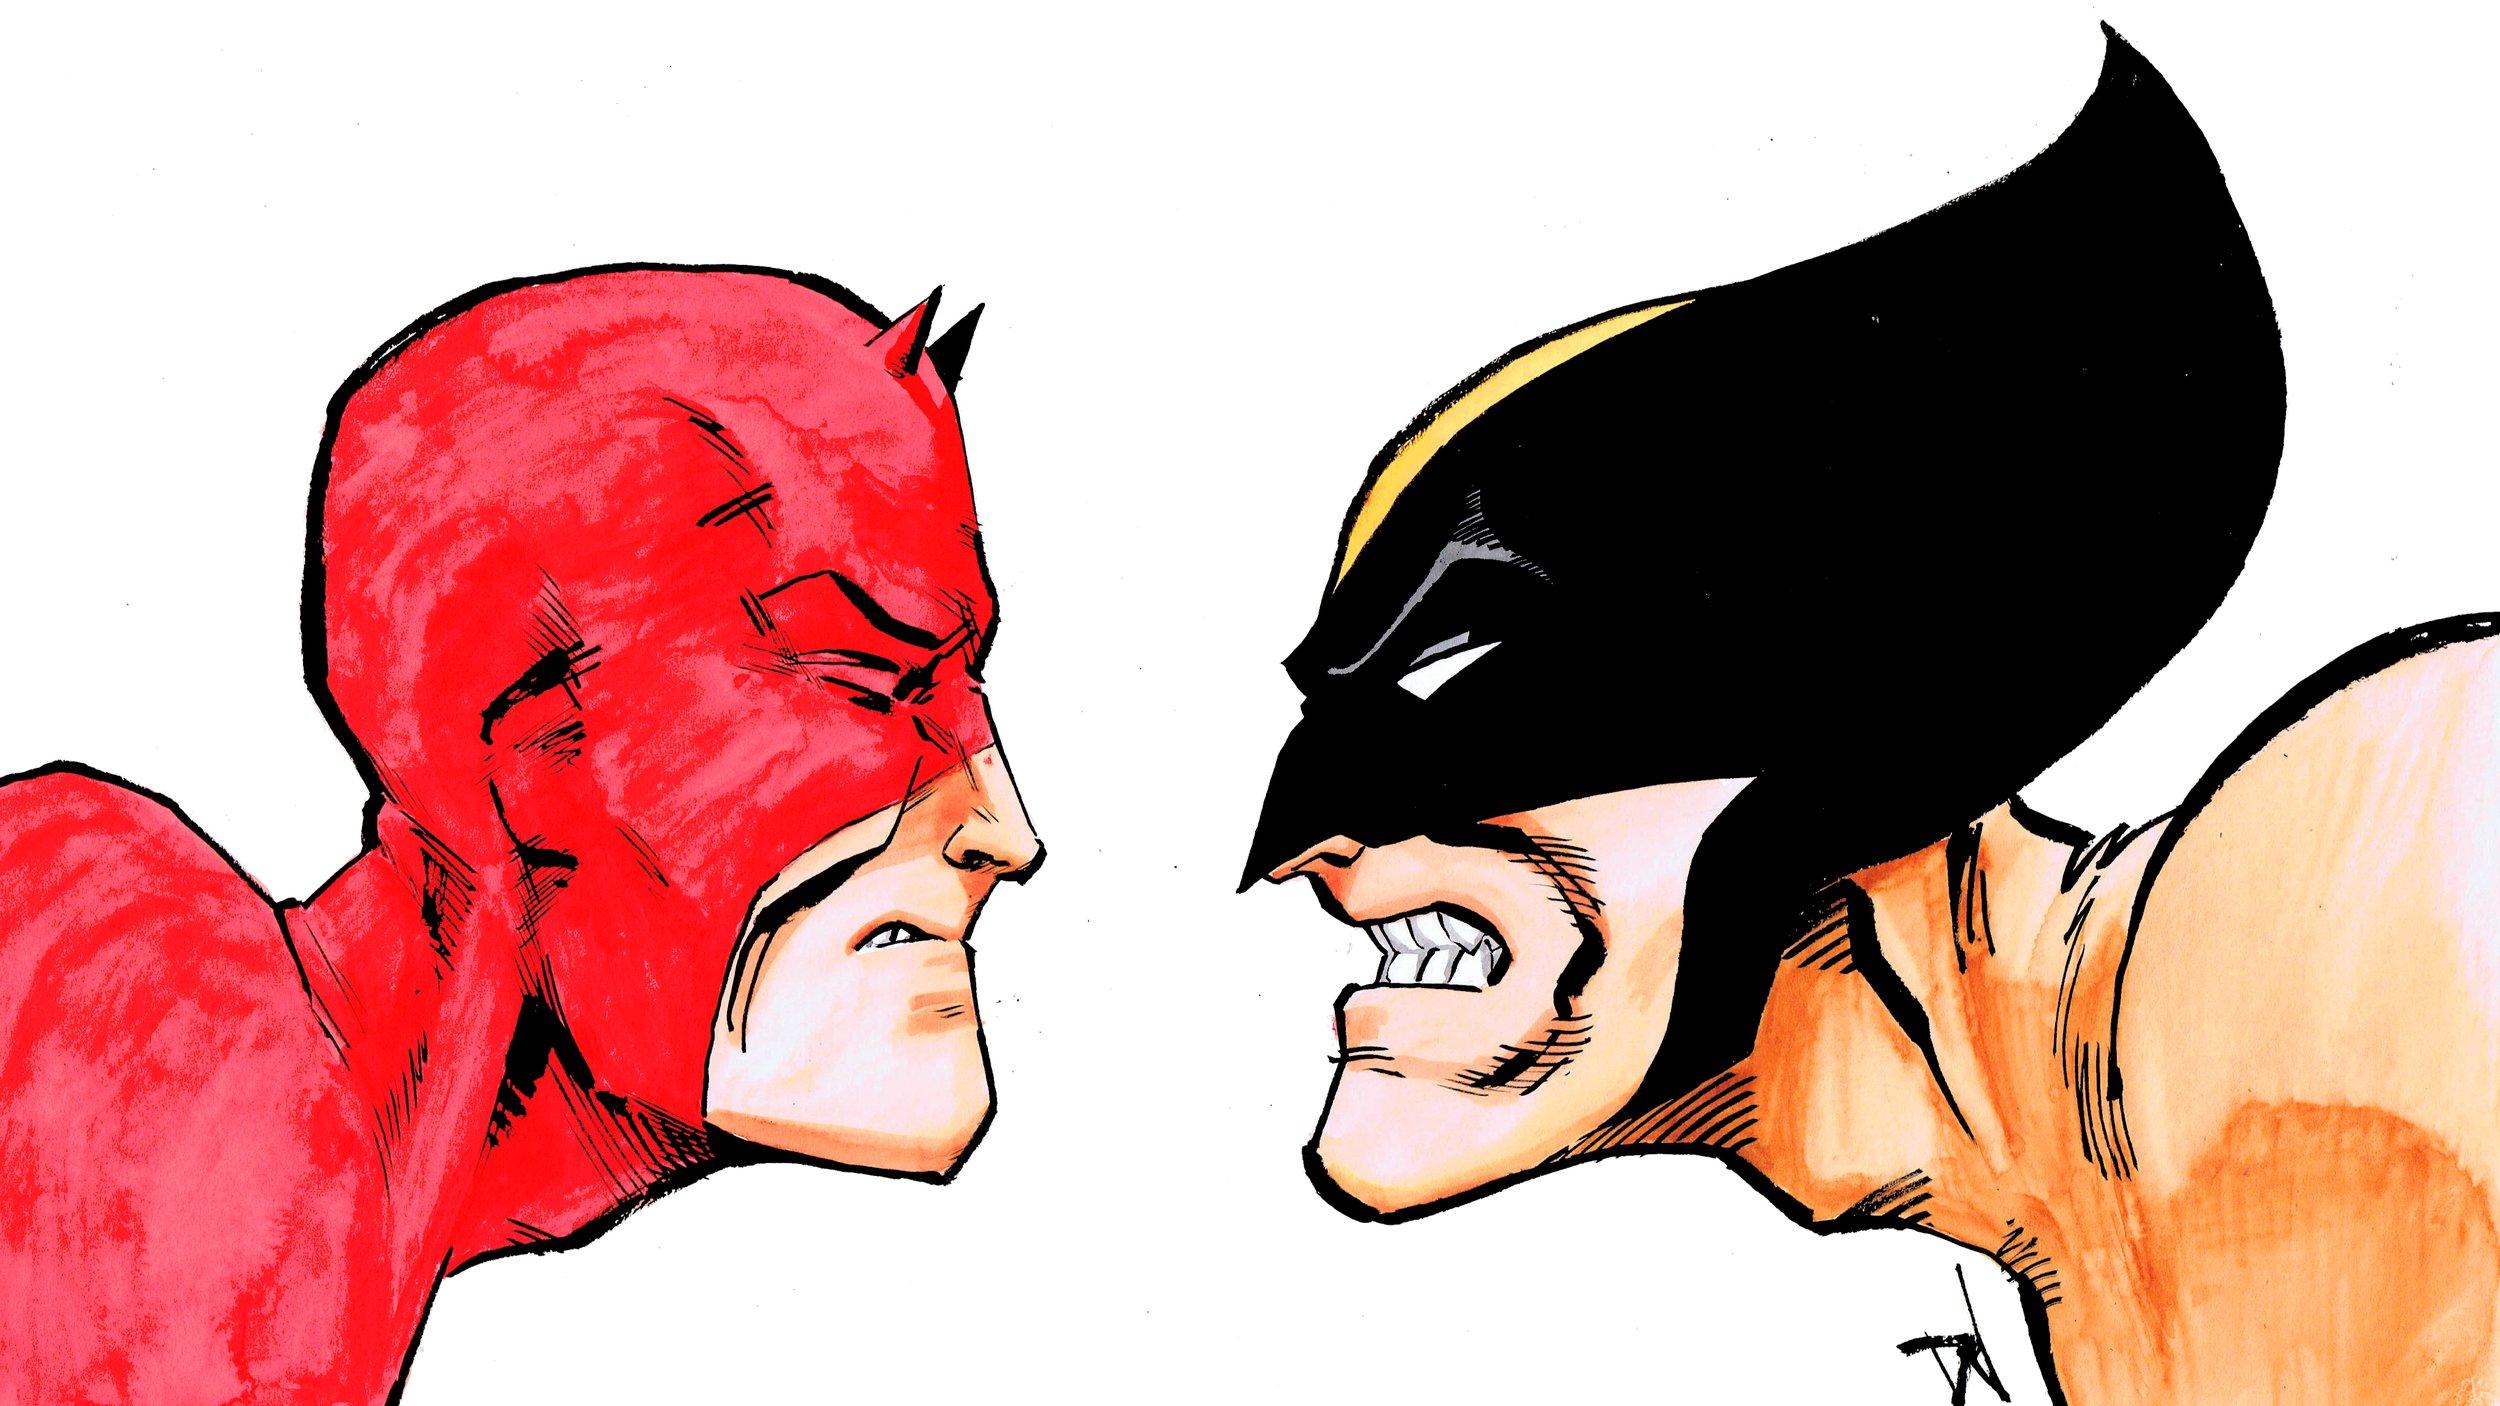 Listen up, bub! DD and Wolverine, art by David Wynne